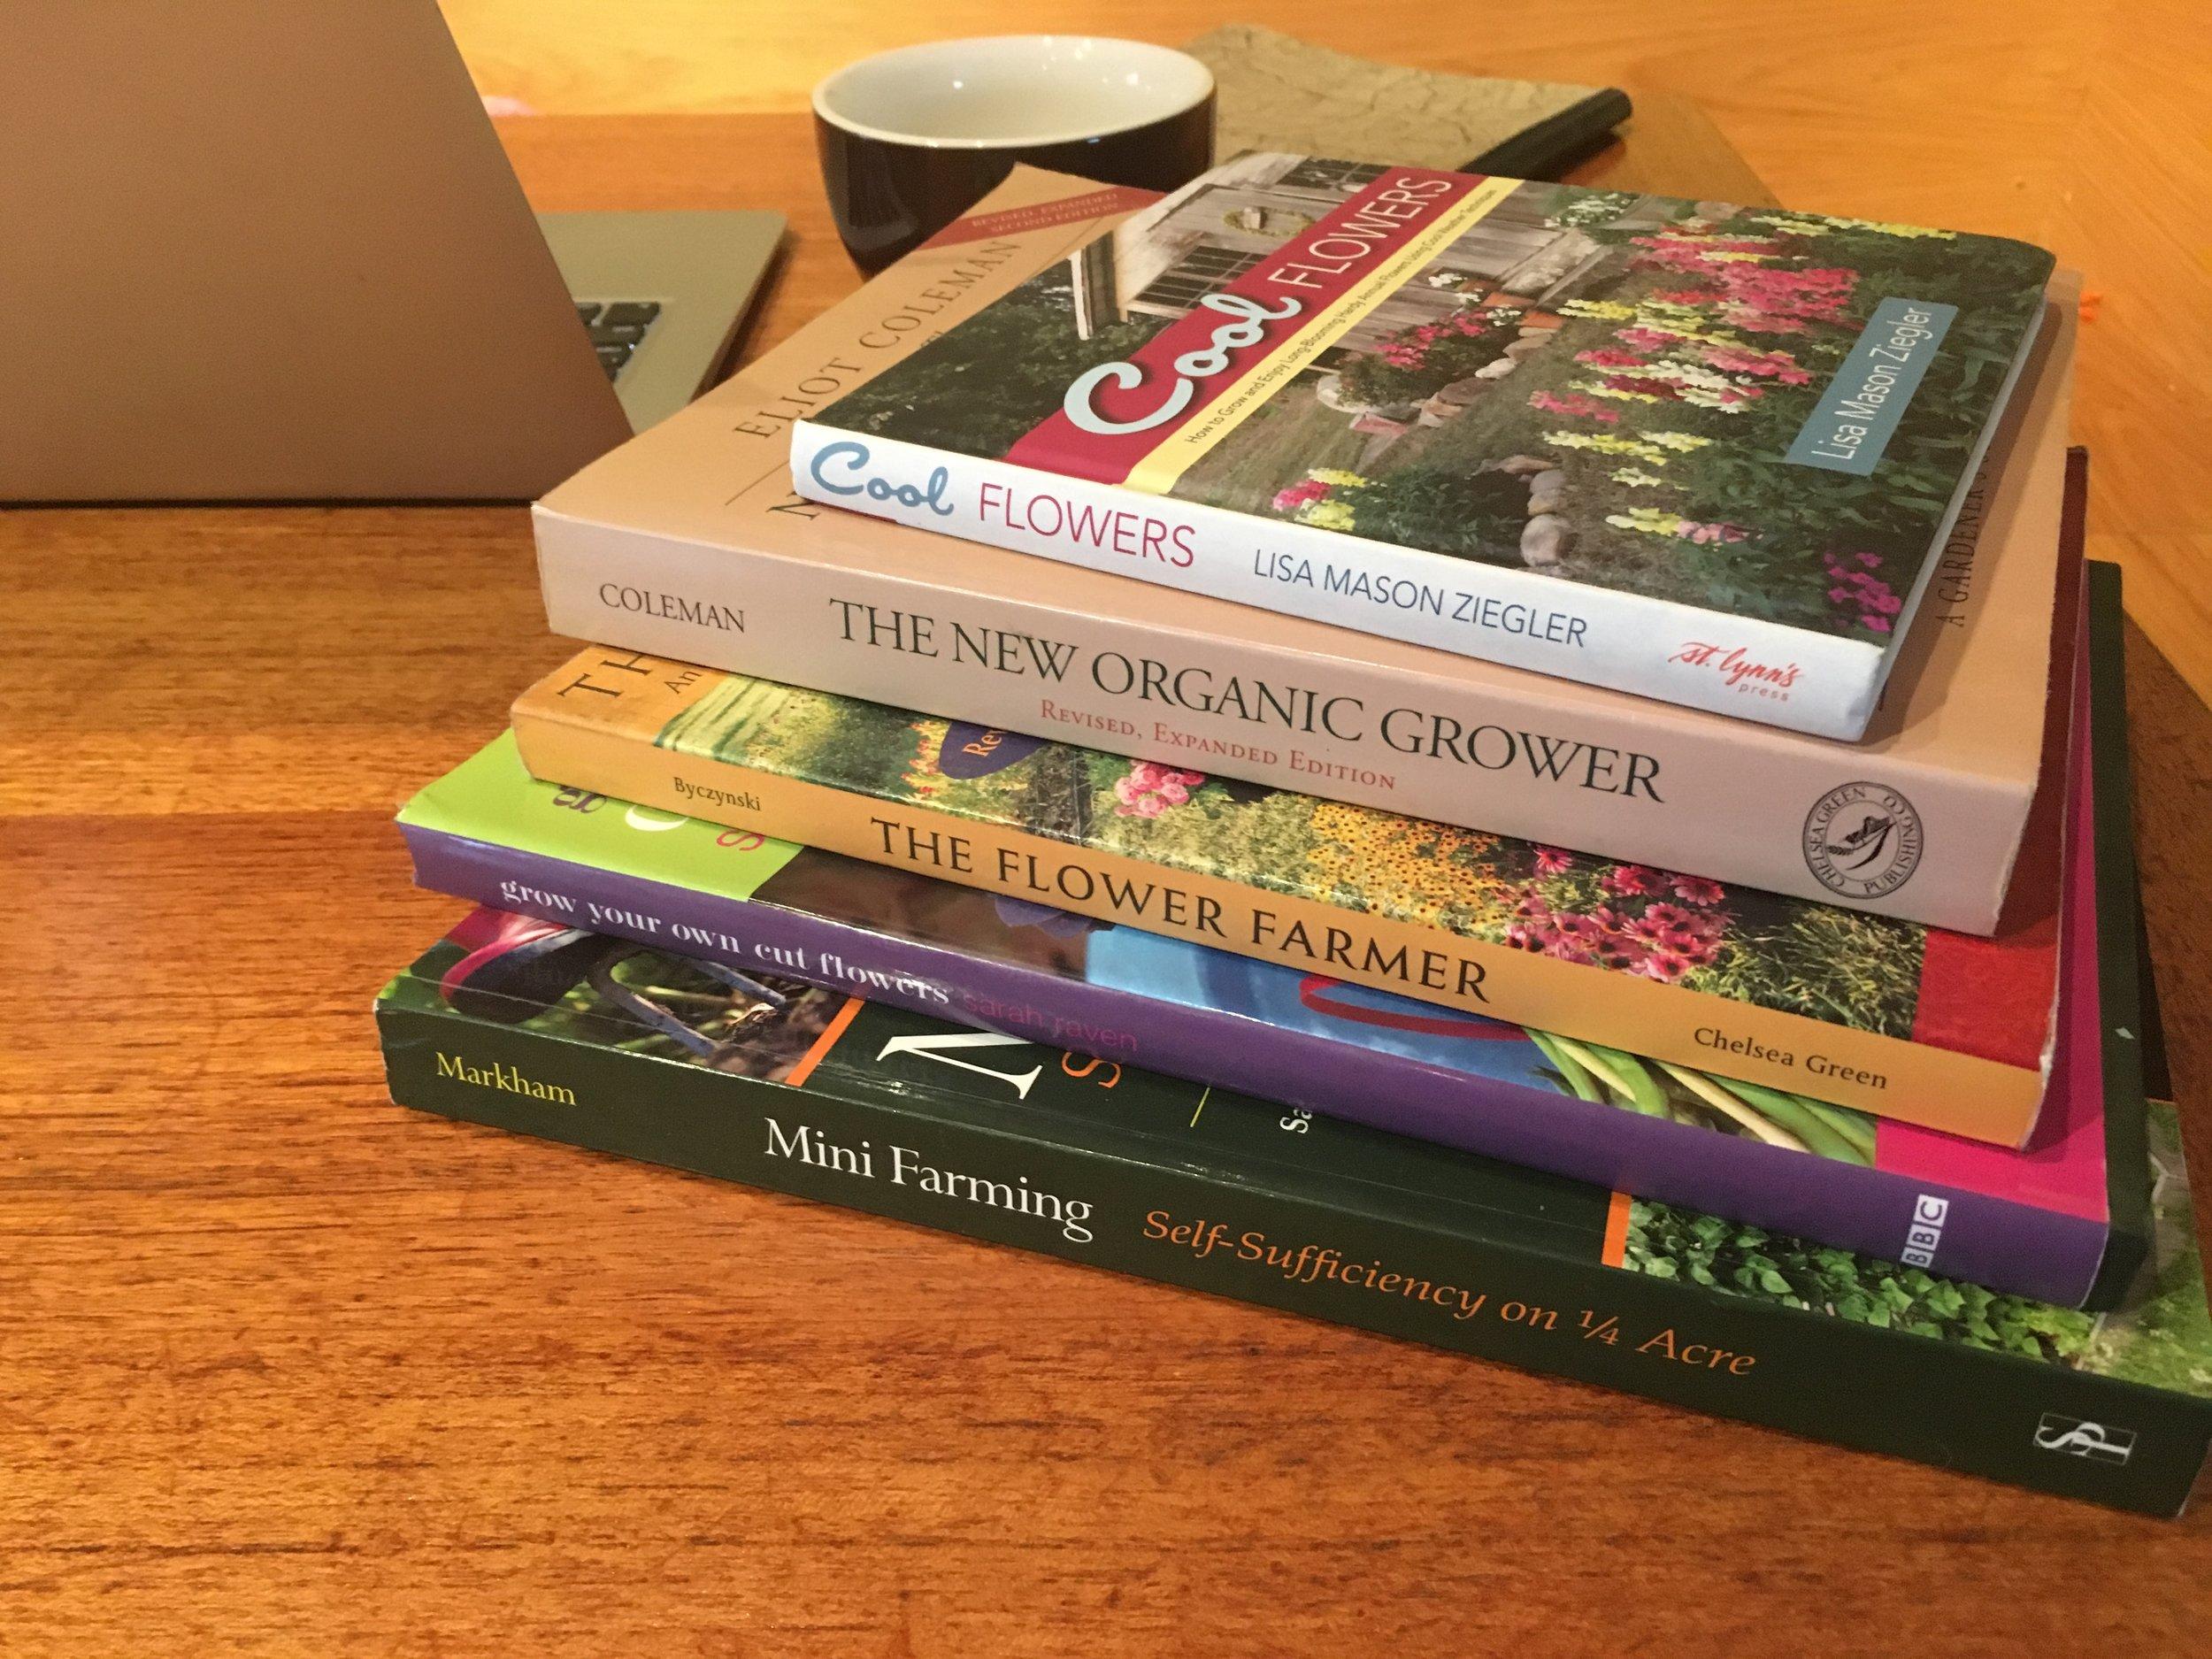 Turnstone-Farm-5-favorite-gardening-books.JPG